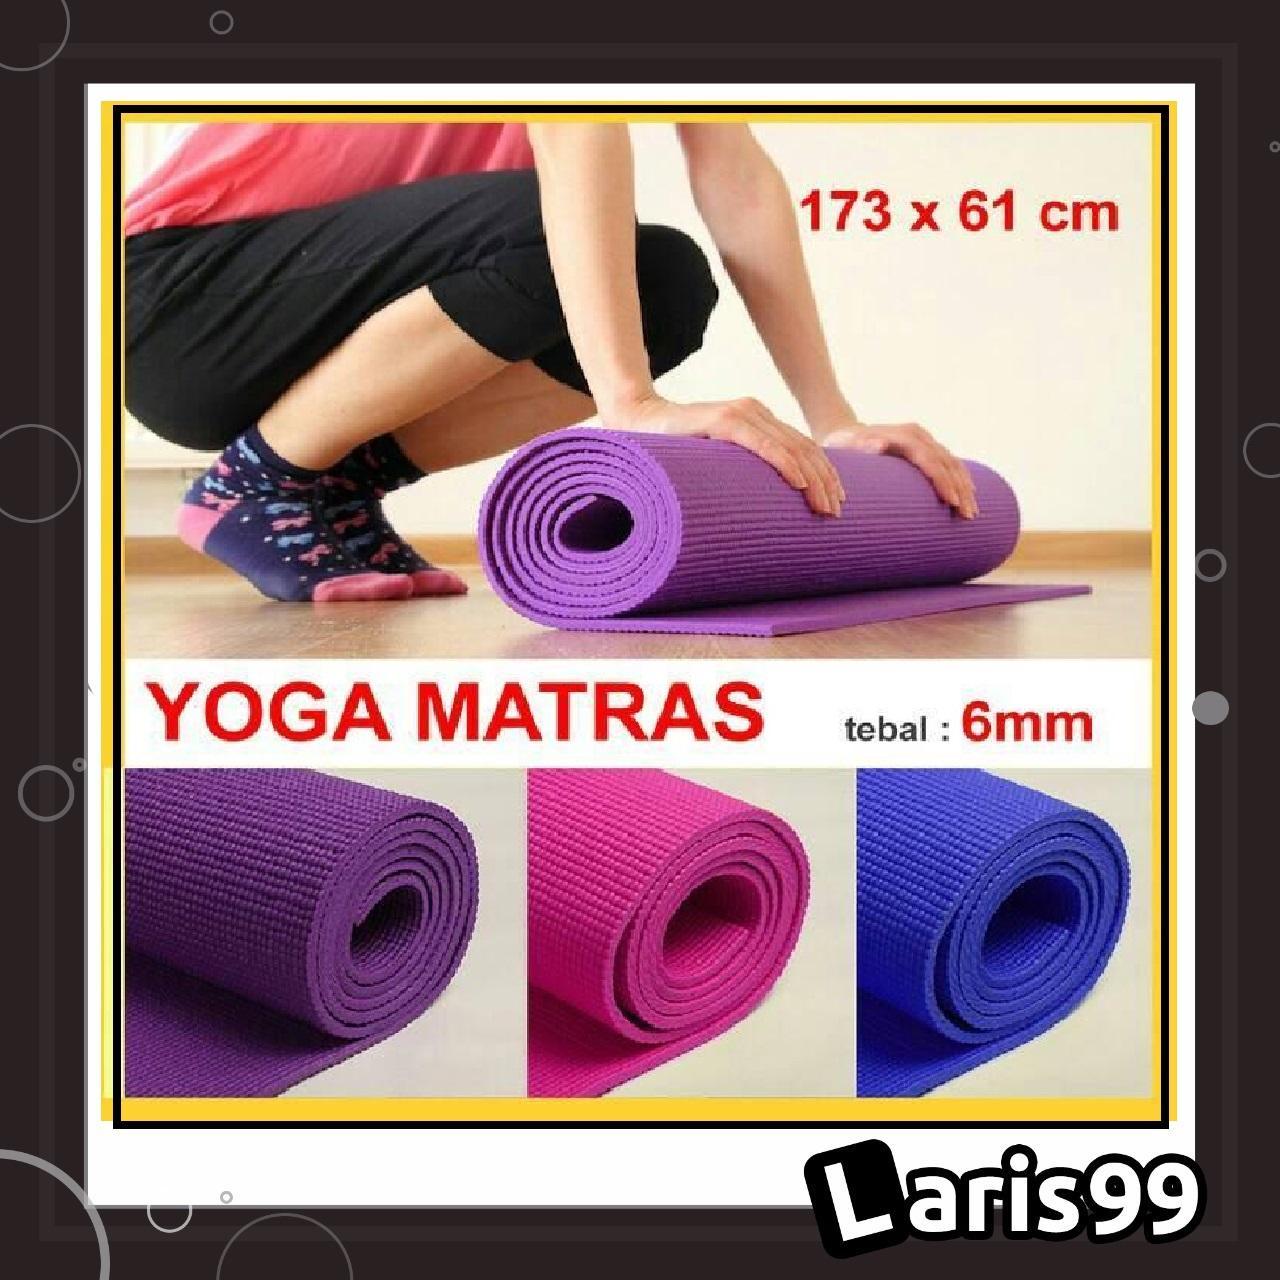 Laris99 Mty Matras Yoga Anti Selip Kualias Bagus + Tas / Matras Yoga Tebal 7mm / Matras Olahraga By Laris99.